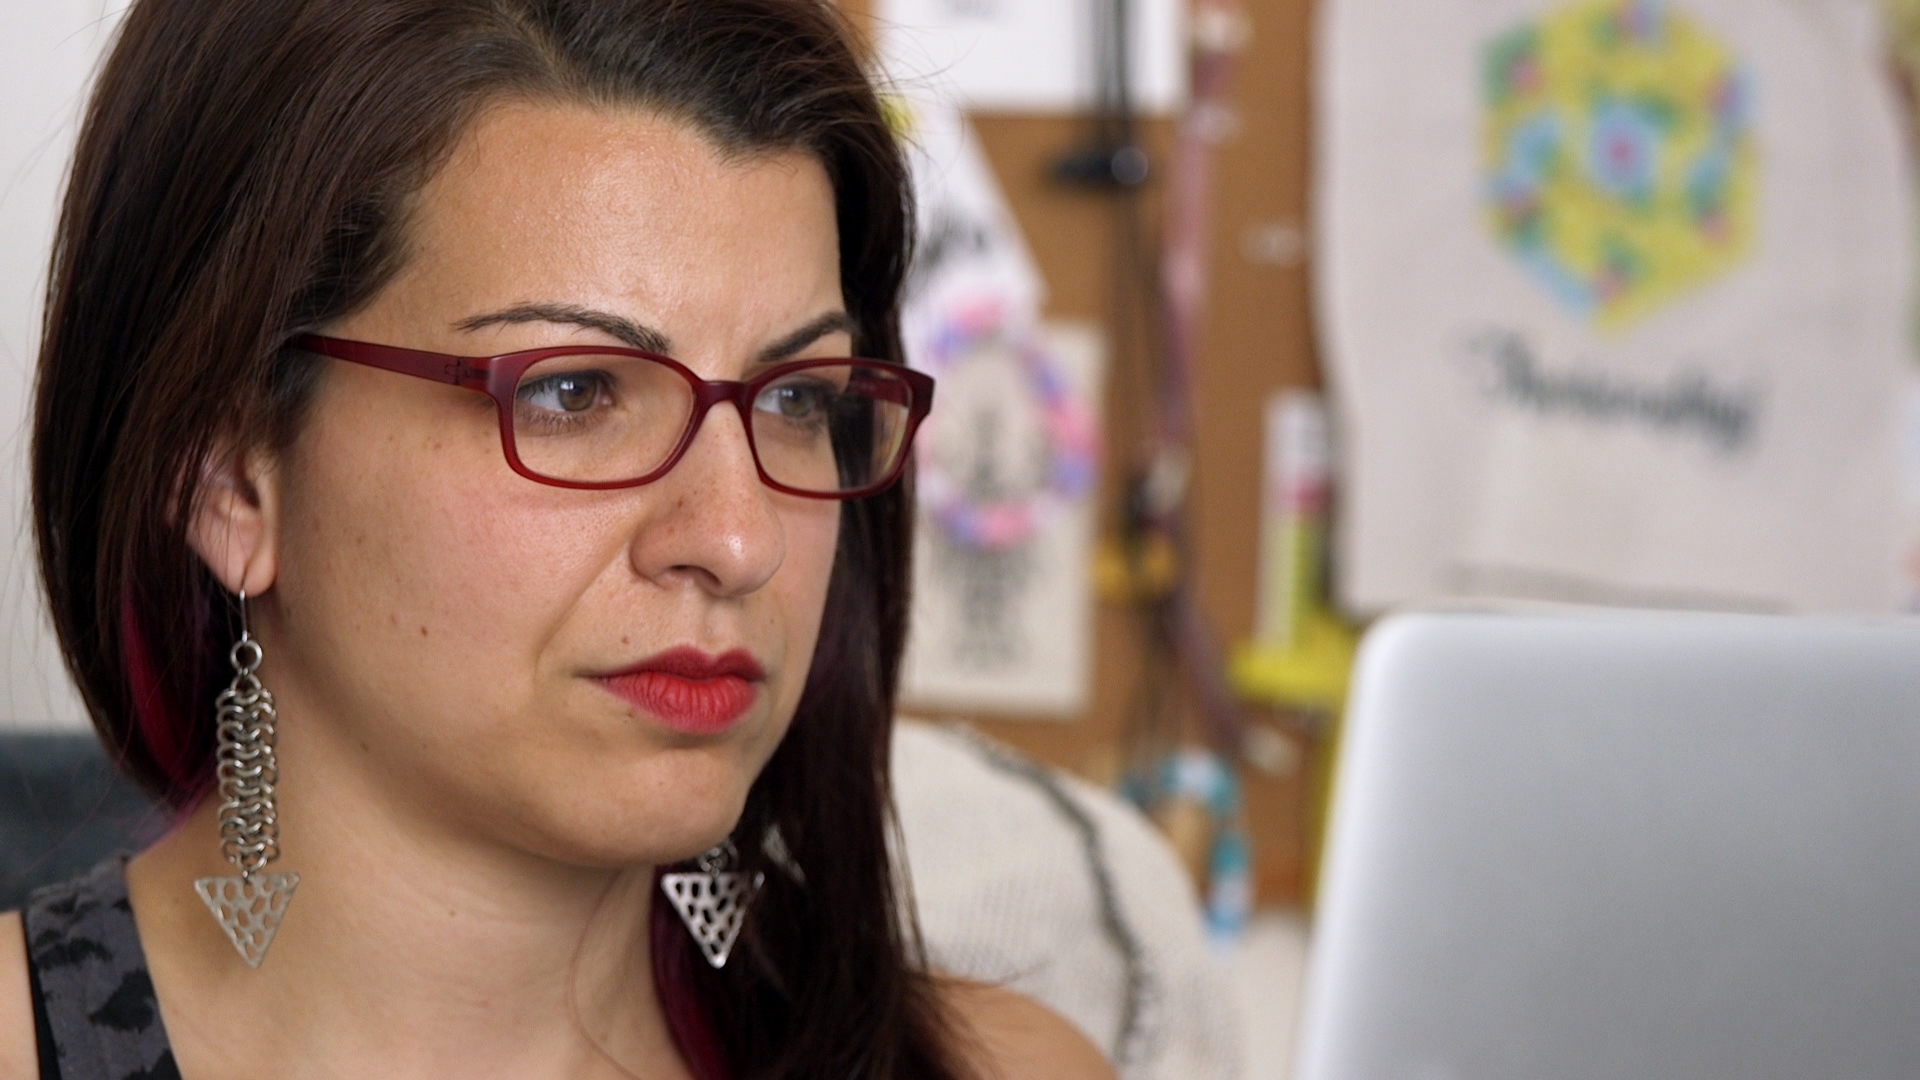 Photo of Netizens subject Anita Sarkeesian looking off camera toward a laptop screen.